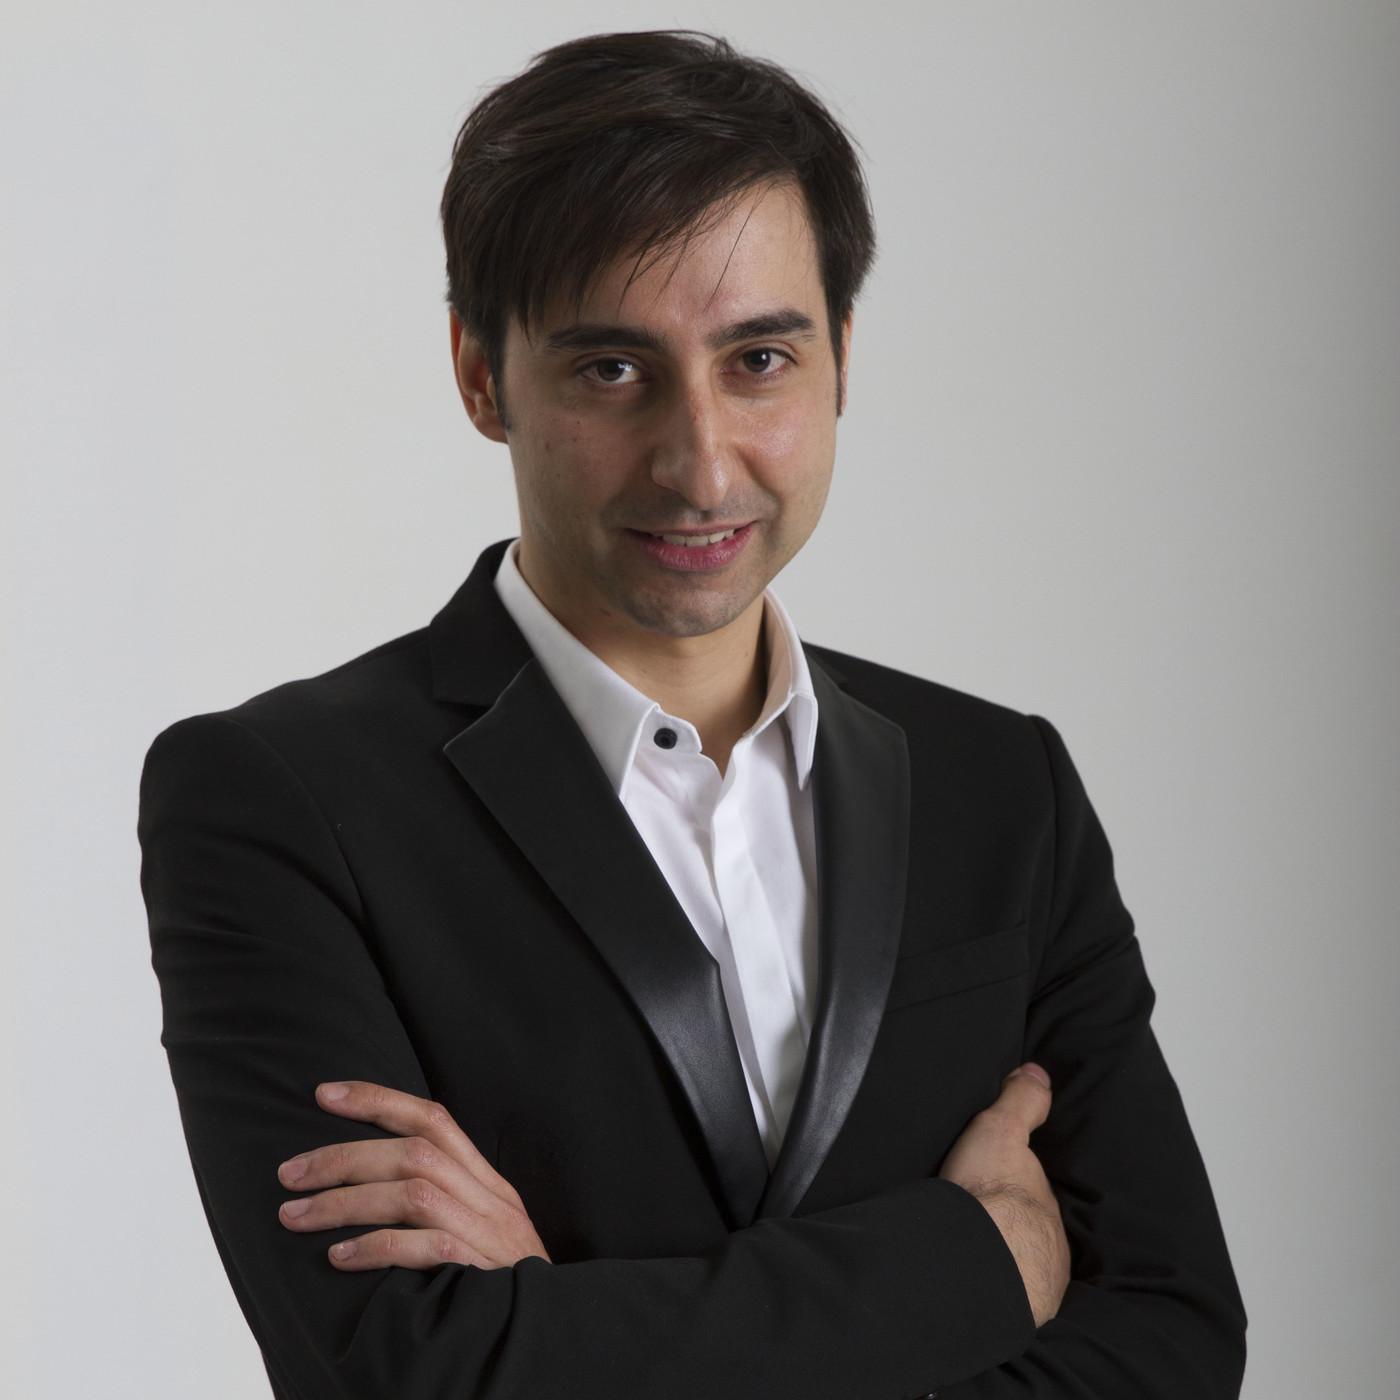 Política, diplomacia y ciencia, con Lorenzo Melchor